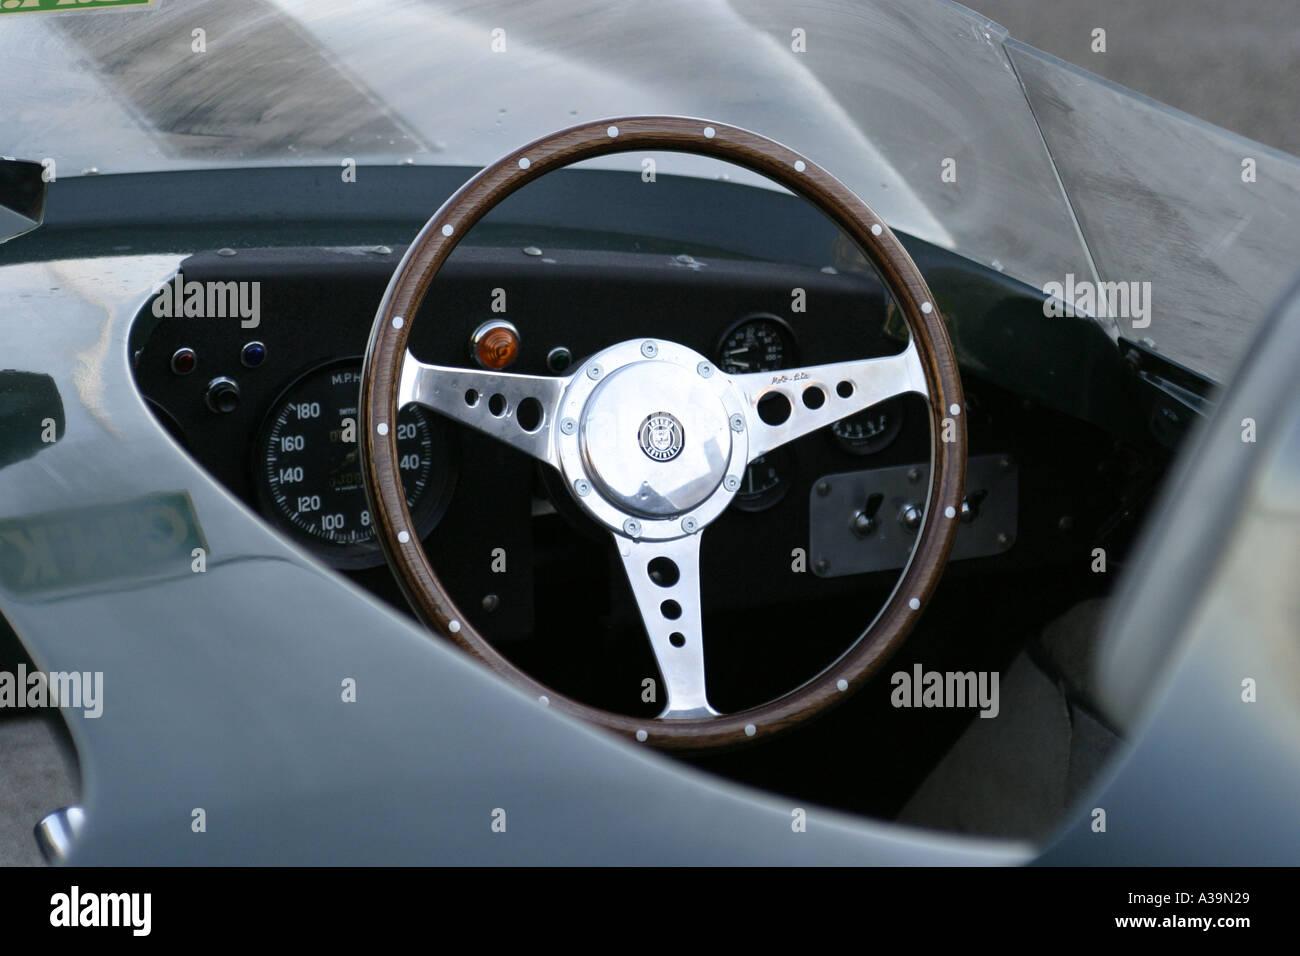 d type jaguar steering wheel and dashboard outside hillsborough stock photo royalty free image. Black Bedroom Furniture Sets. Home Design Ideas